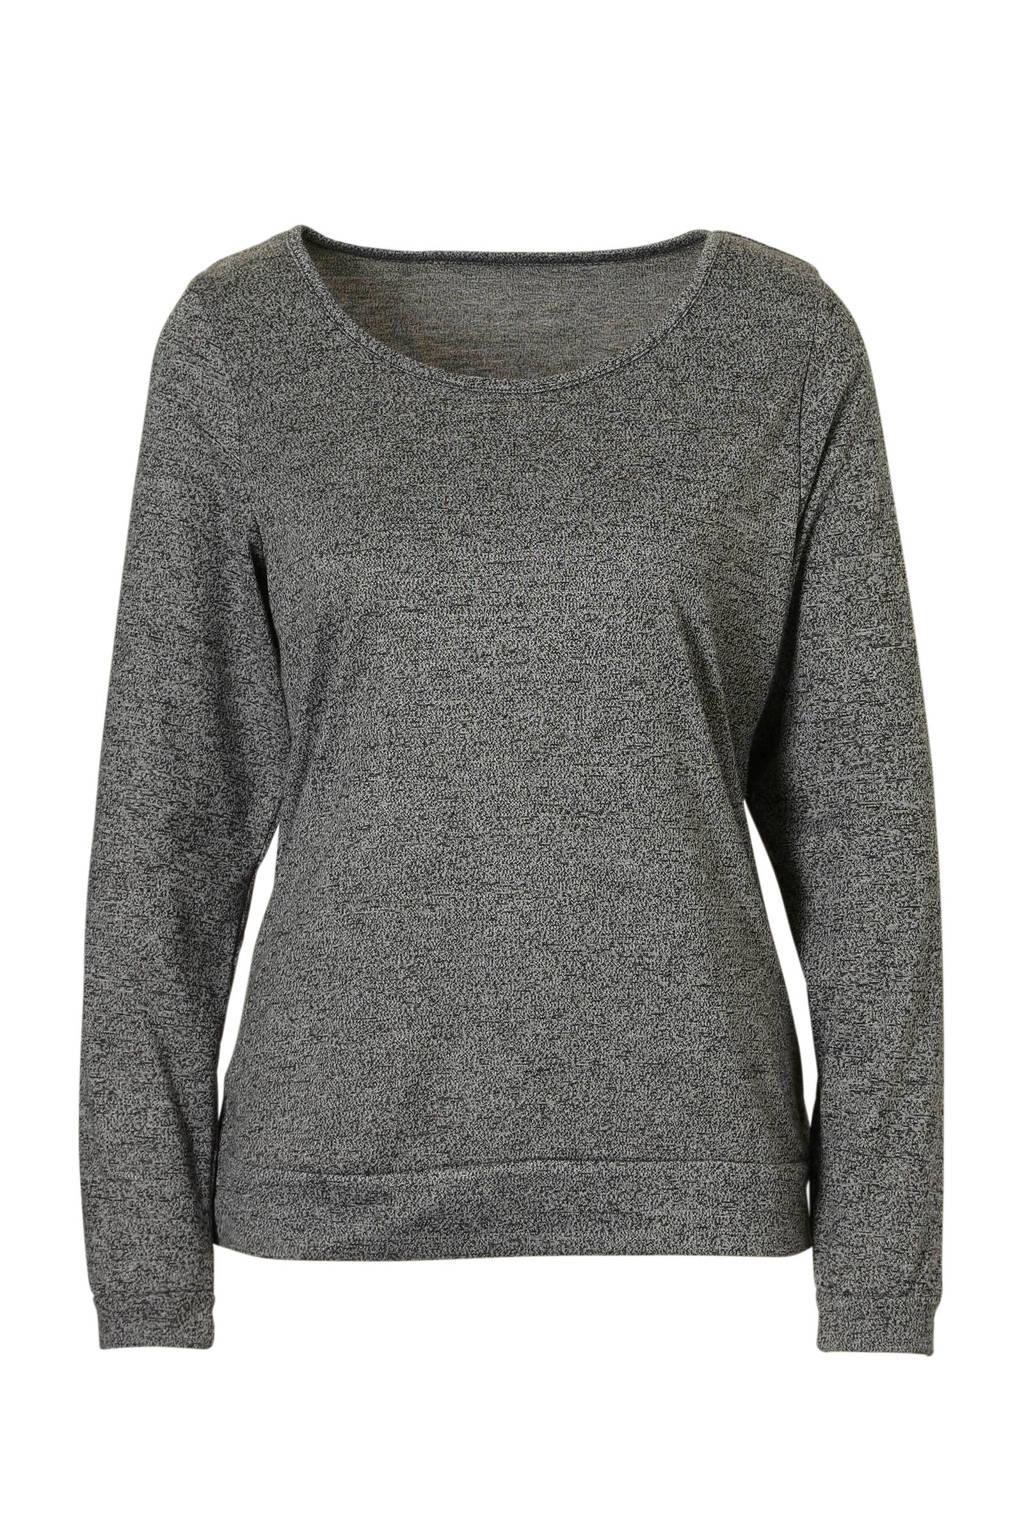 Sassa Mode pyjamatop met ronde hals grijs mêlee, grijs mêlee